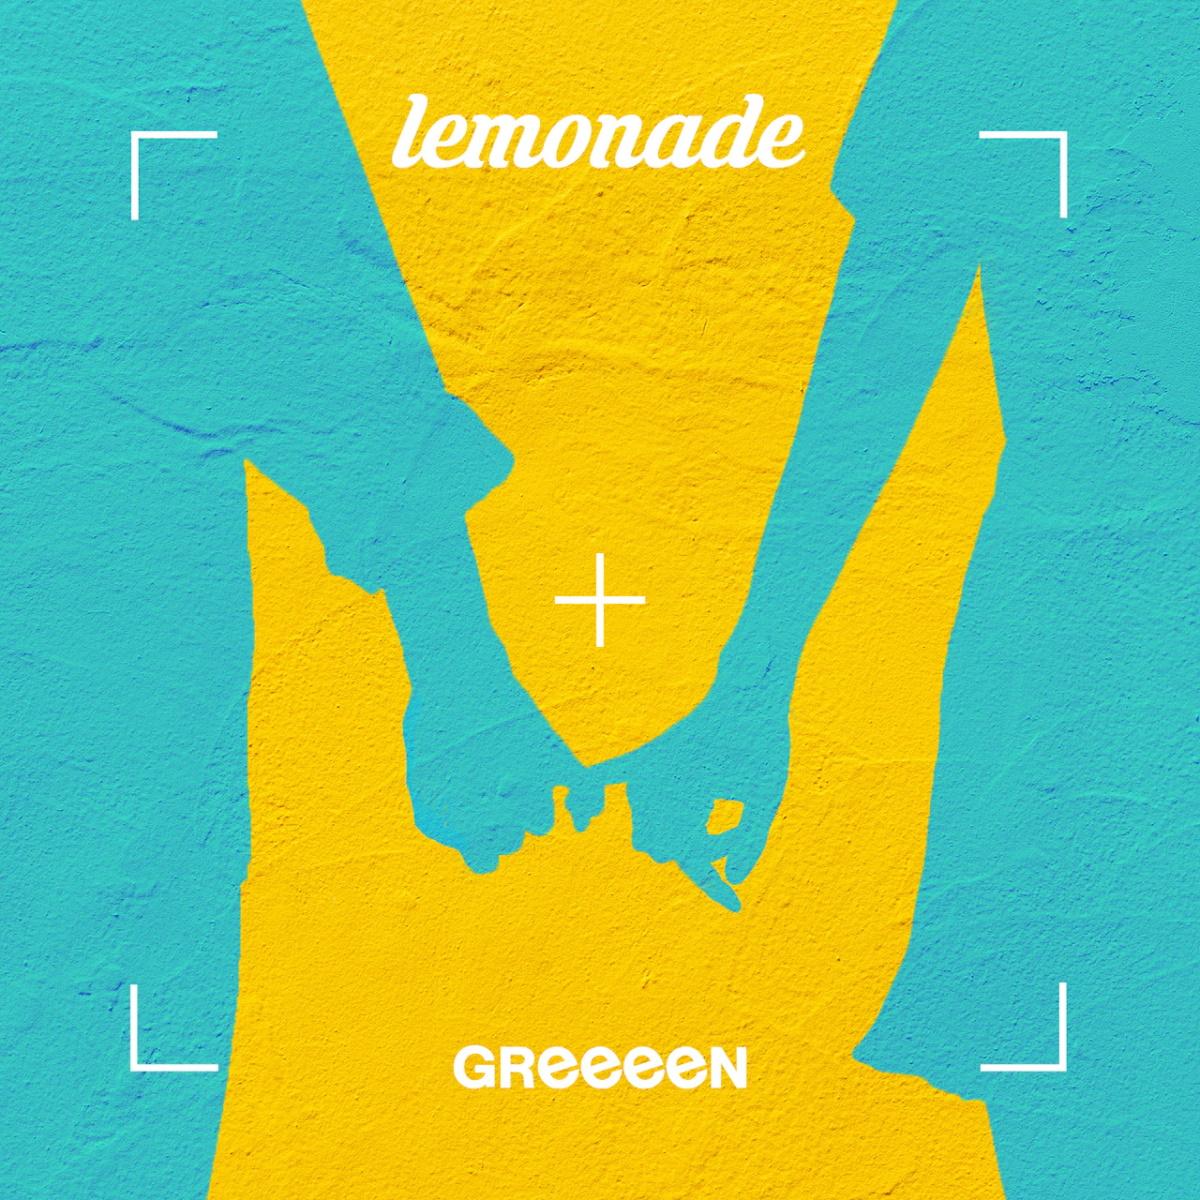 『GReeeeN - lemonade』収録の『lemonade』ジャケット